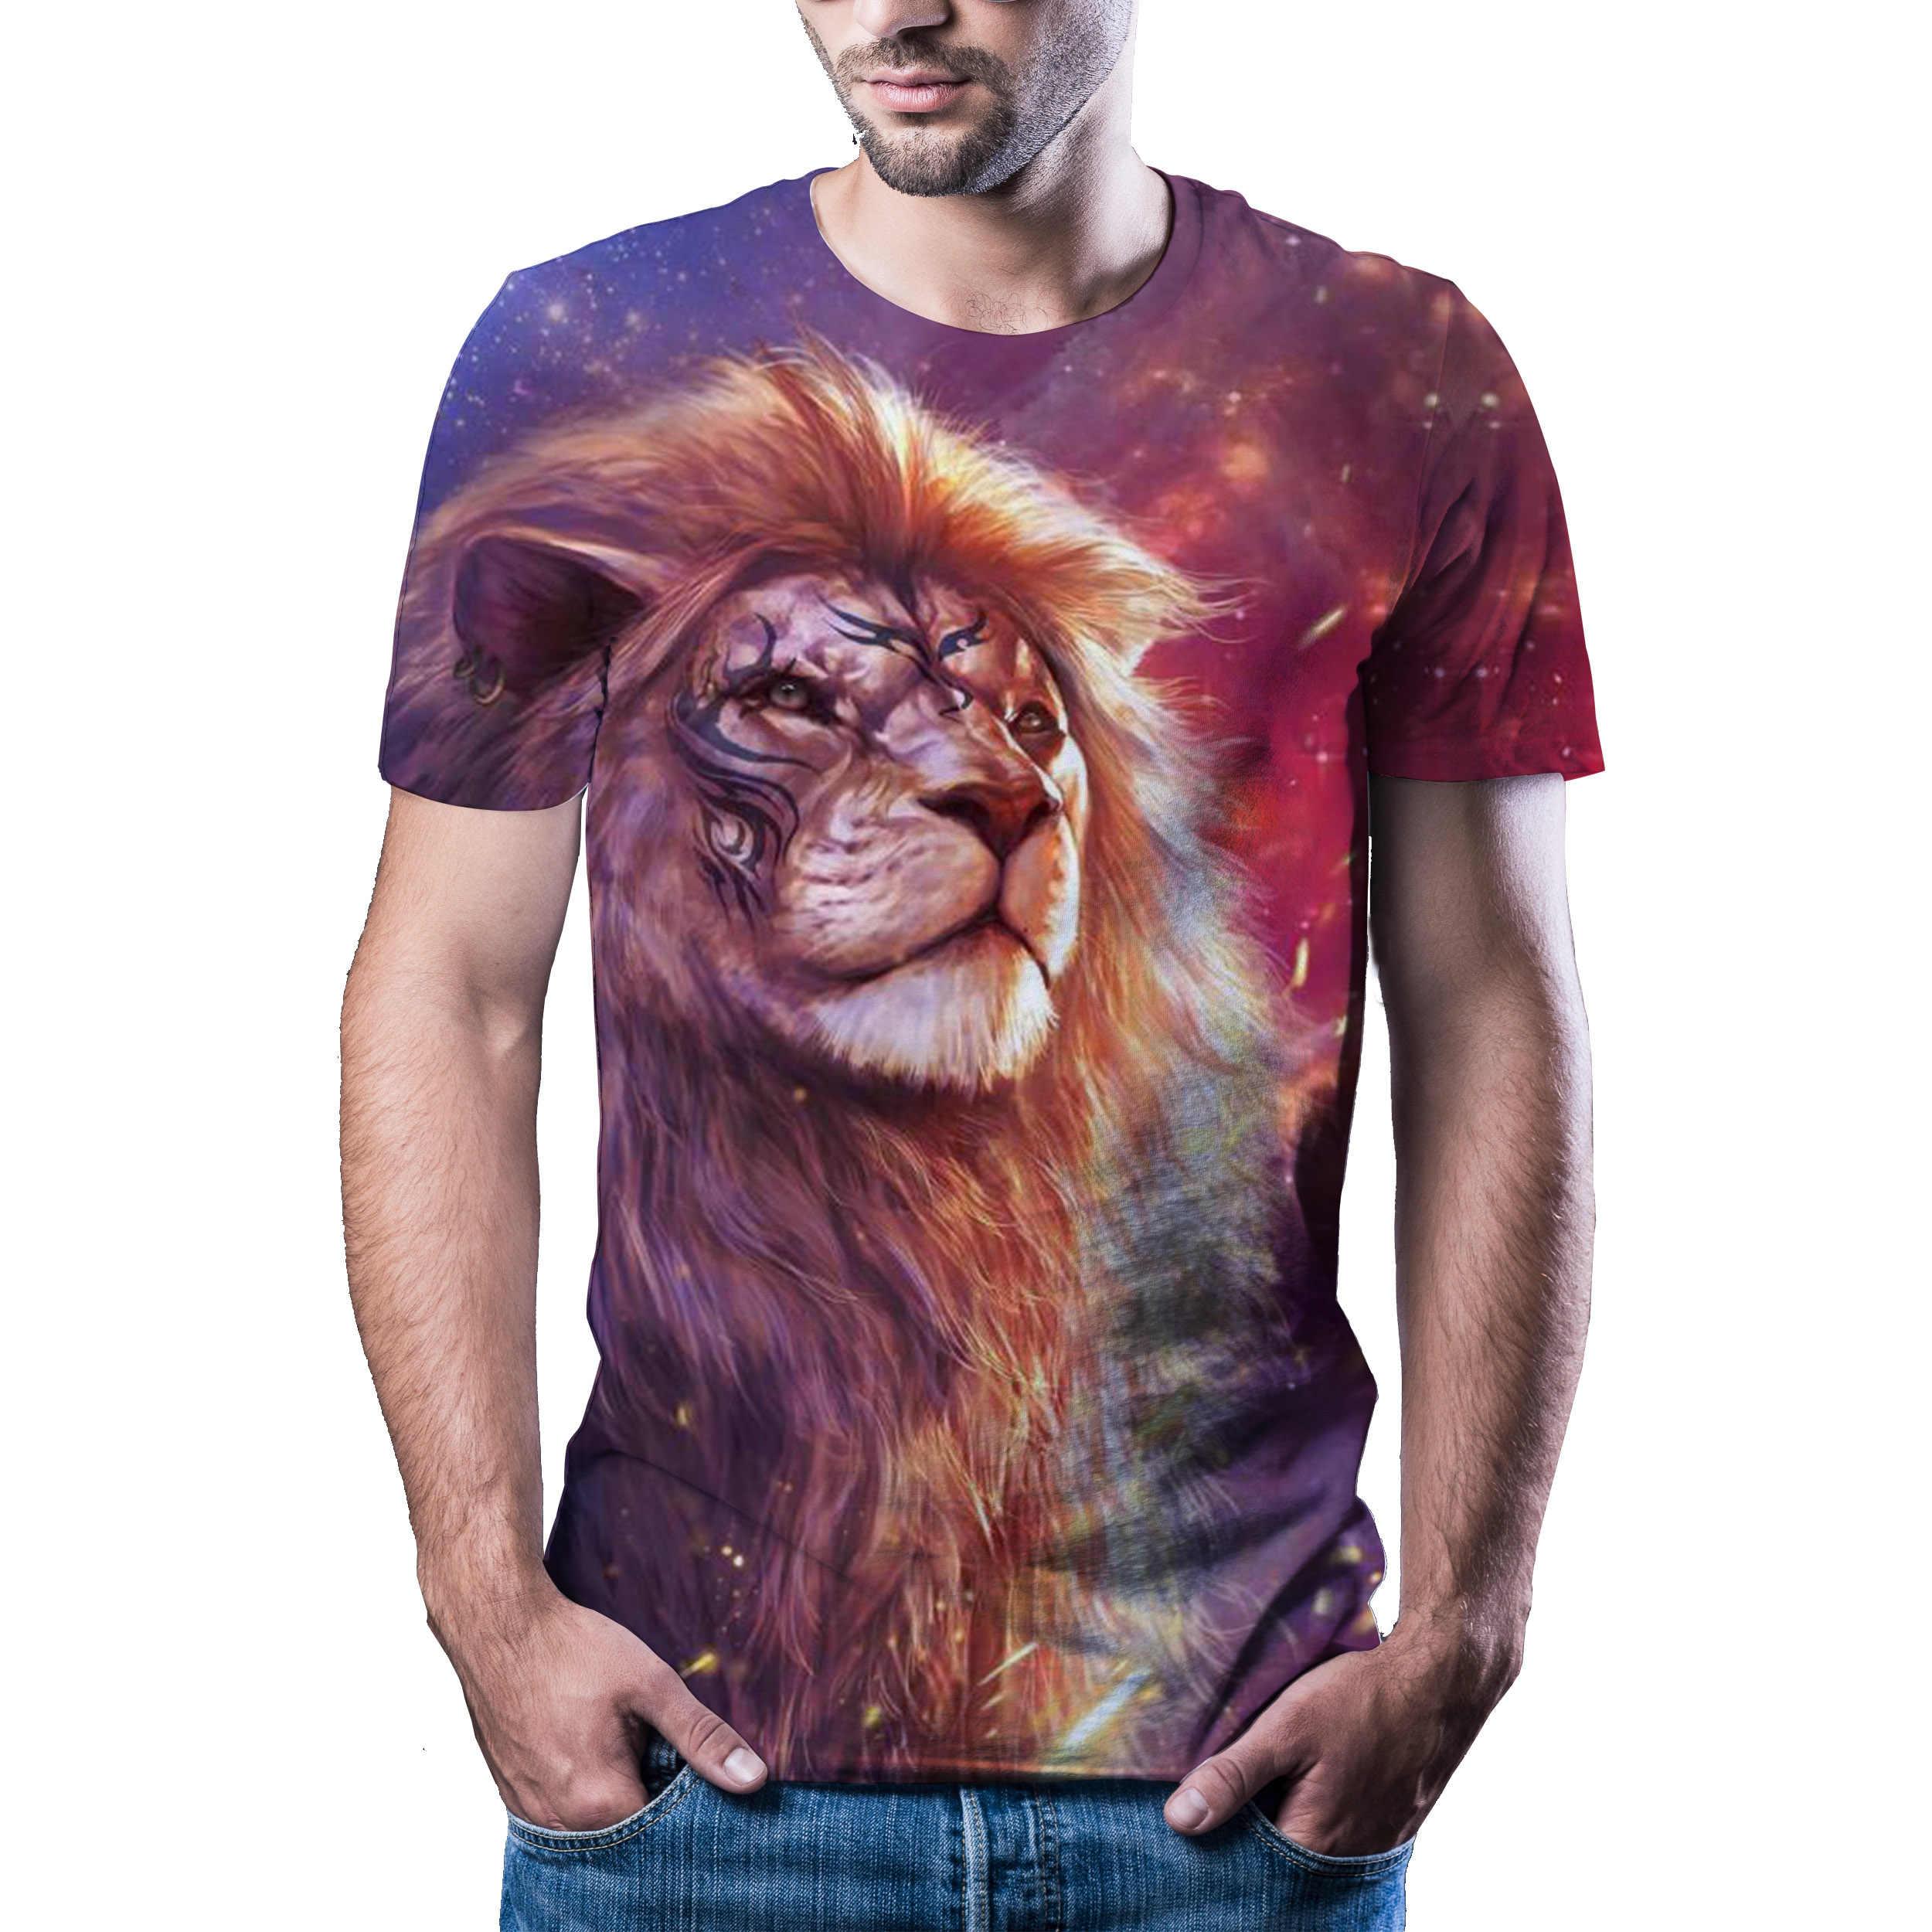 2020 yeni erkek kaplan T-shirt baskı yaz hayvan doğa T-shirt marka tişört büyük boy moda kısa kollu shirtXXS 6XL